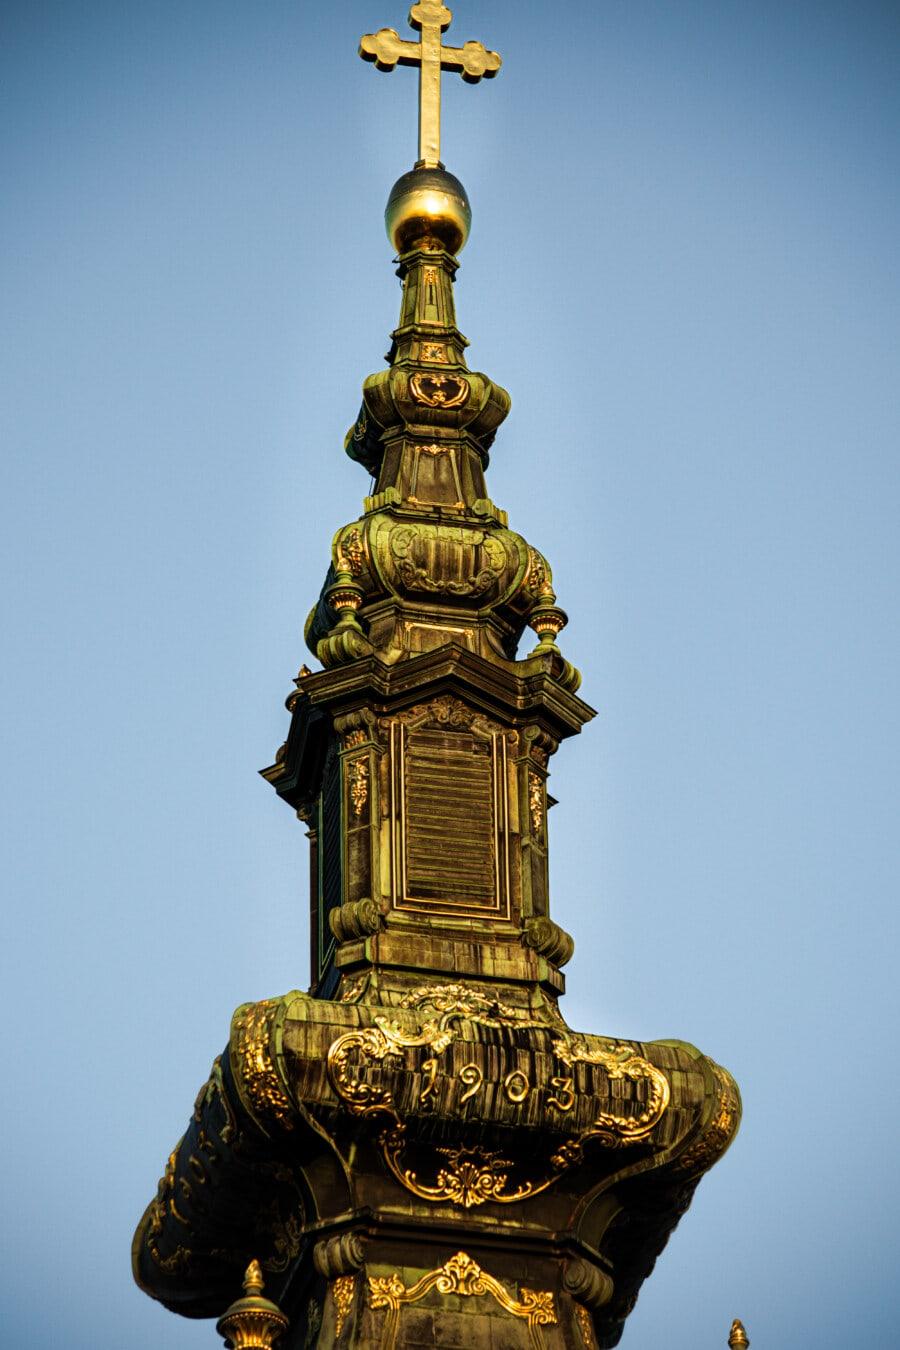 Turnul Bisericii, cruce, aur, stralucitoare, strălucire aurie, ortodoxe, Rusă, biserica, Monumentul, arhitectura